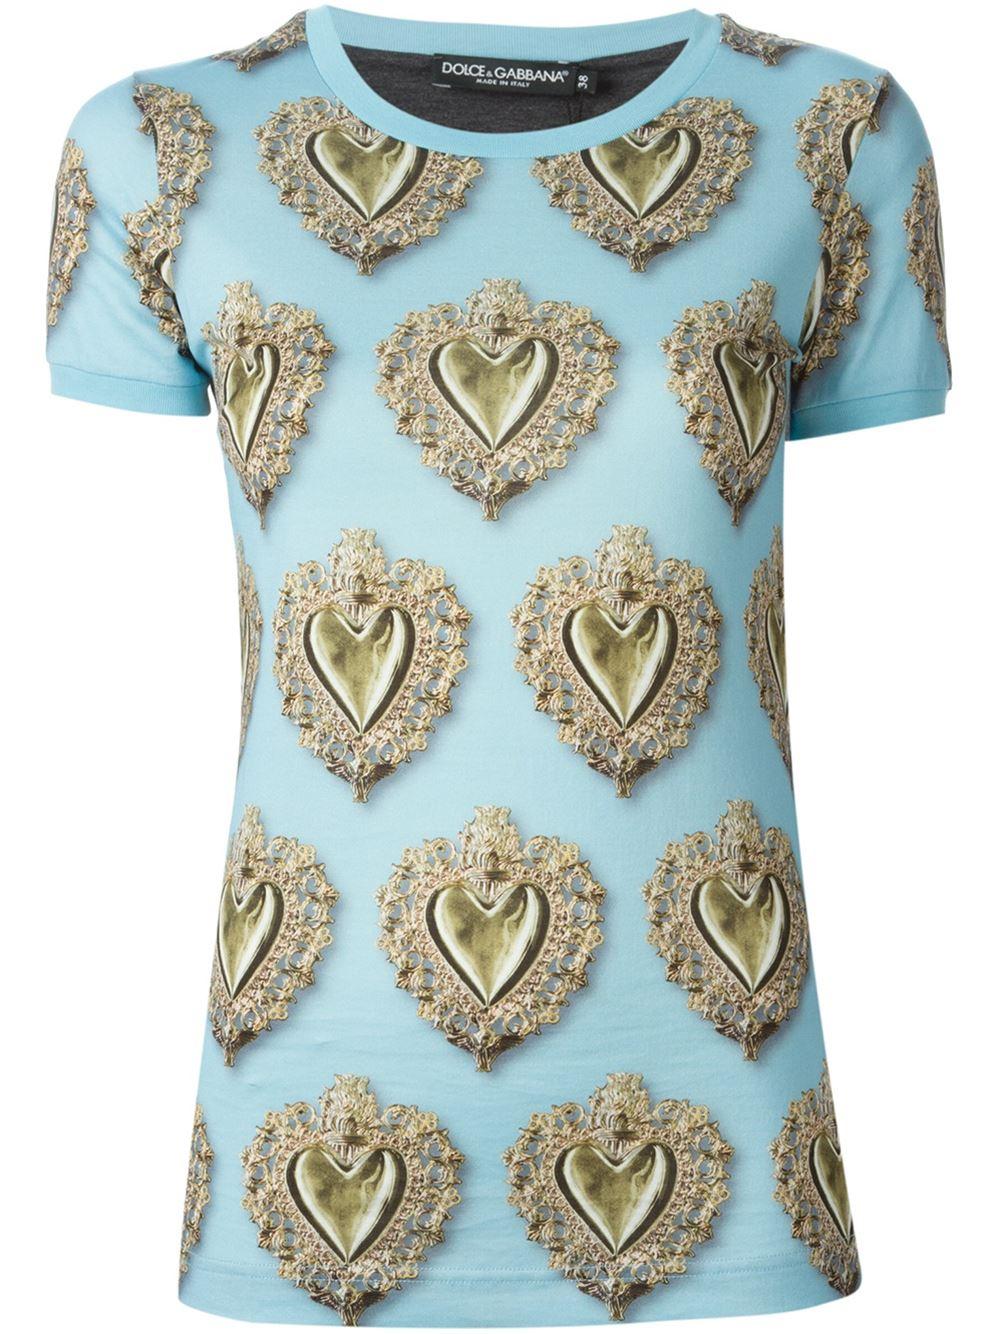 Dolce gabbana sacred heart printed t shirt in blue lyst for Dolce and gabbana printed t shirts